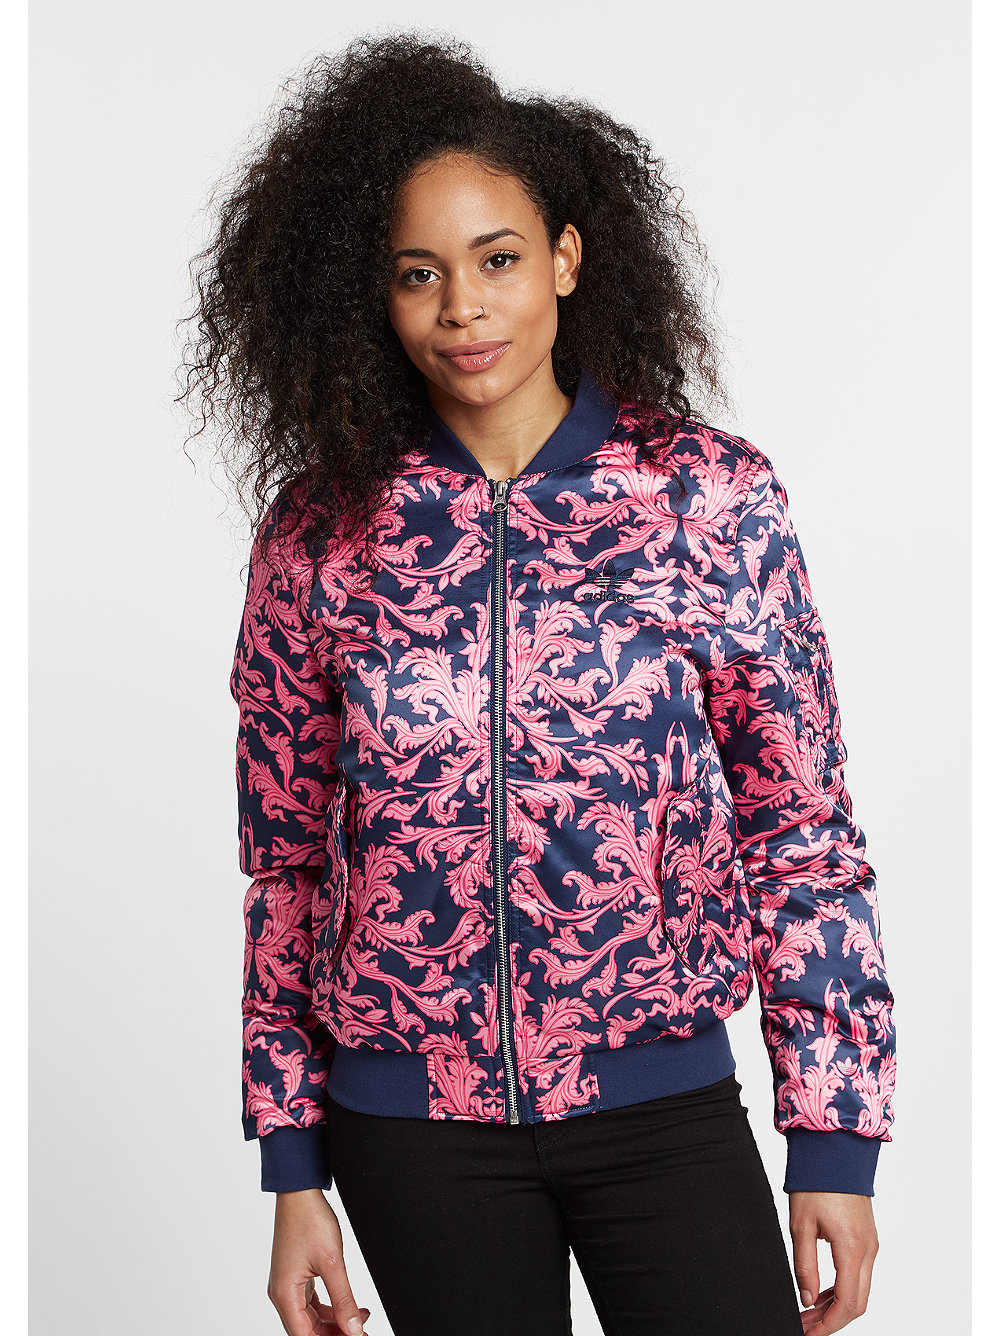 adidas Jacke AOP Satin Bomber dark blue/pink rosa XS,S,M